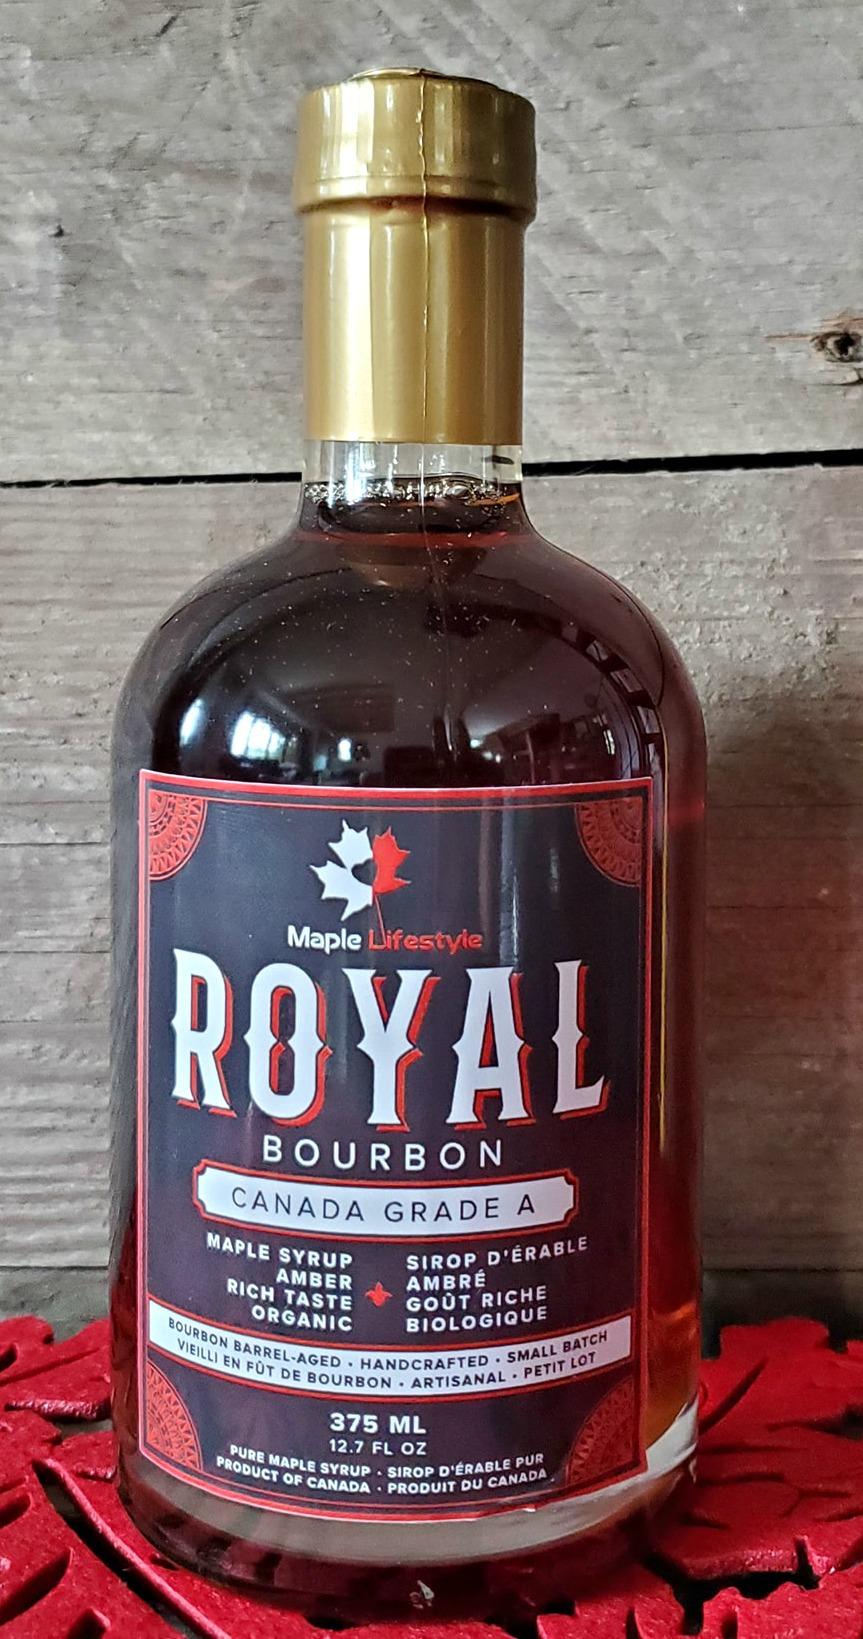 Royal Maple Lifestyles Bourbon Maple Syrup